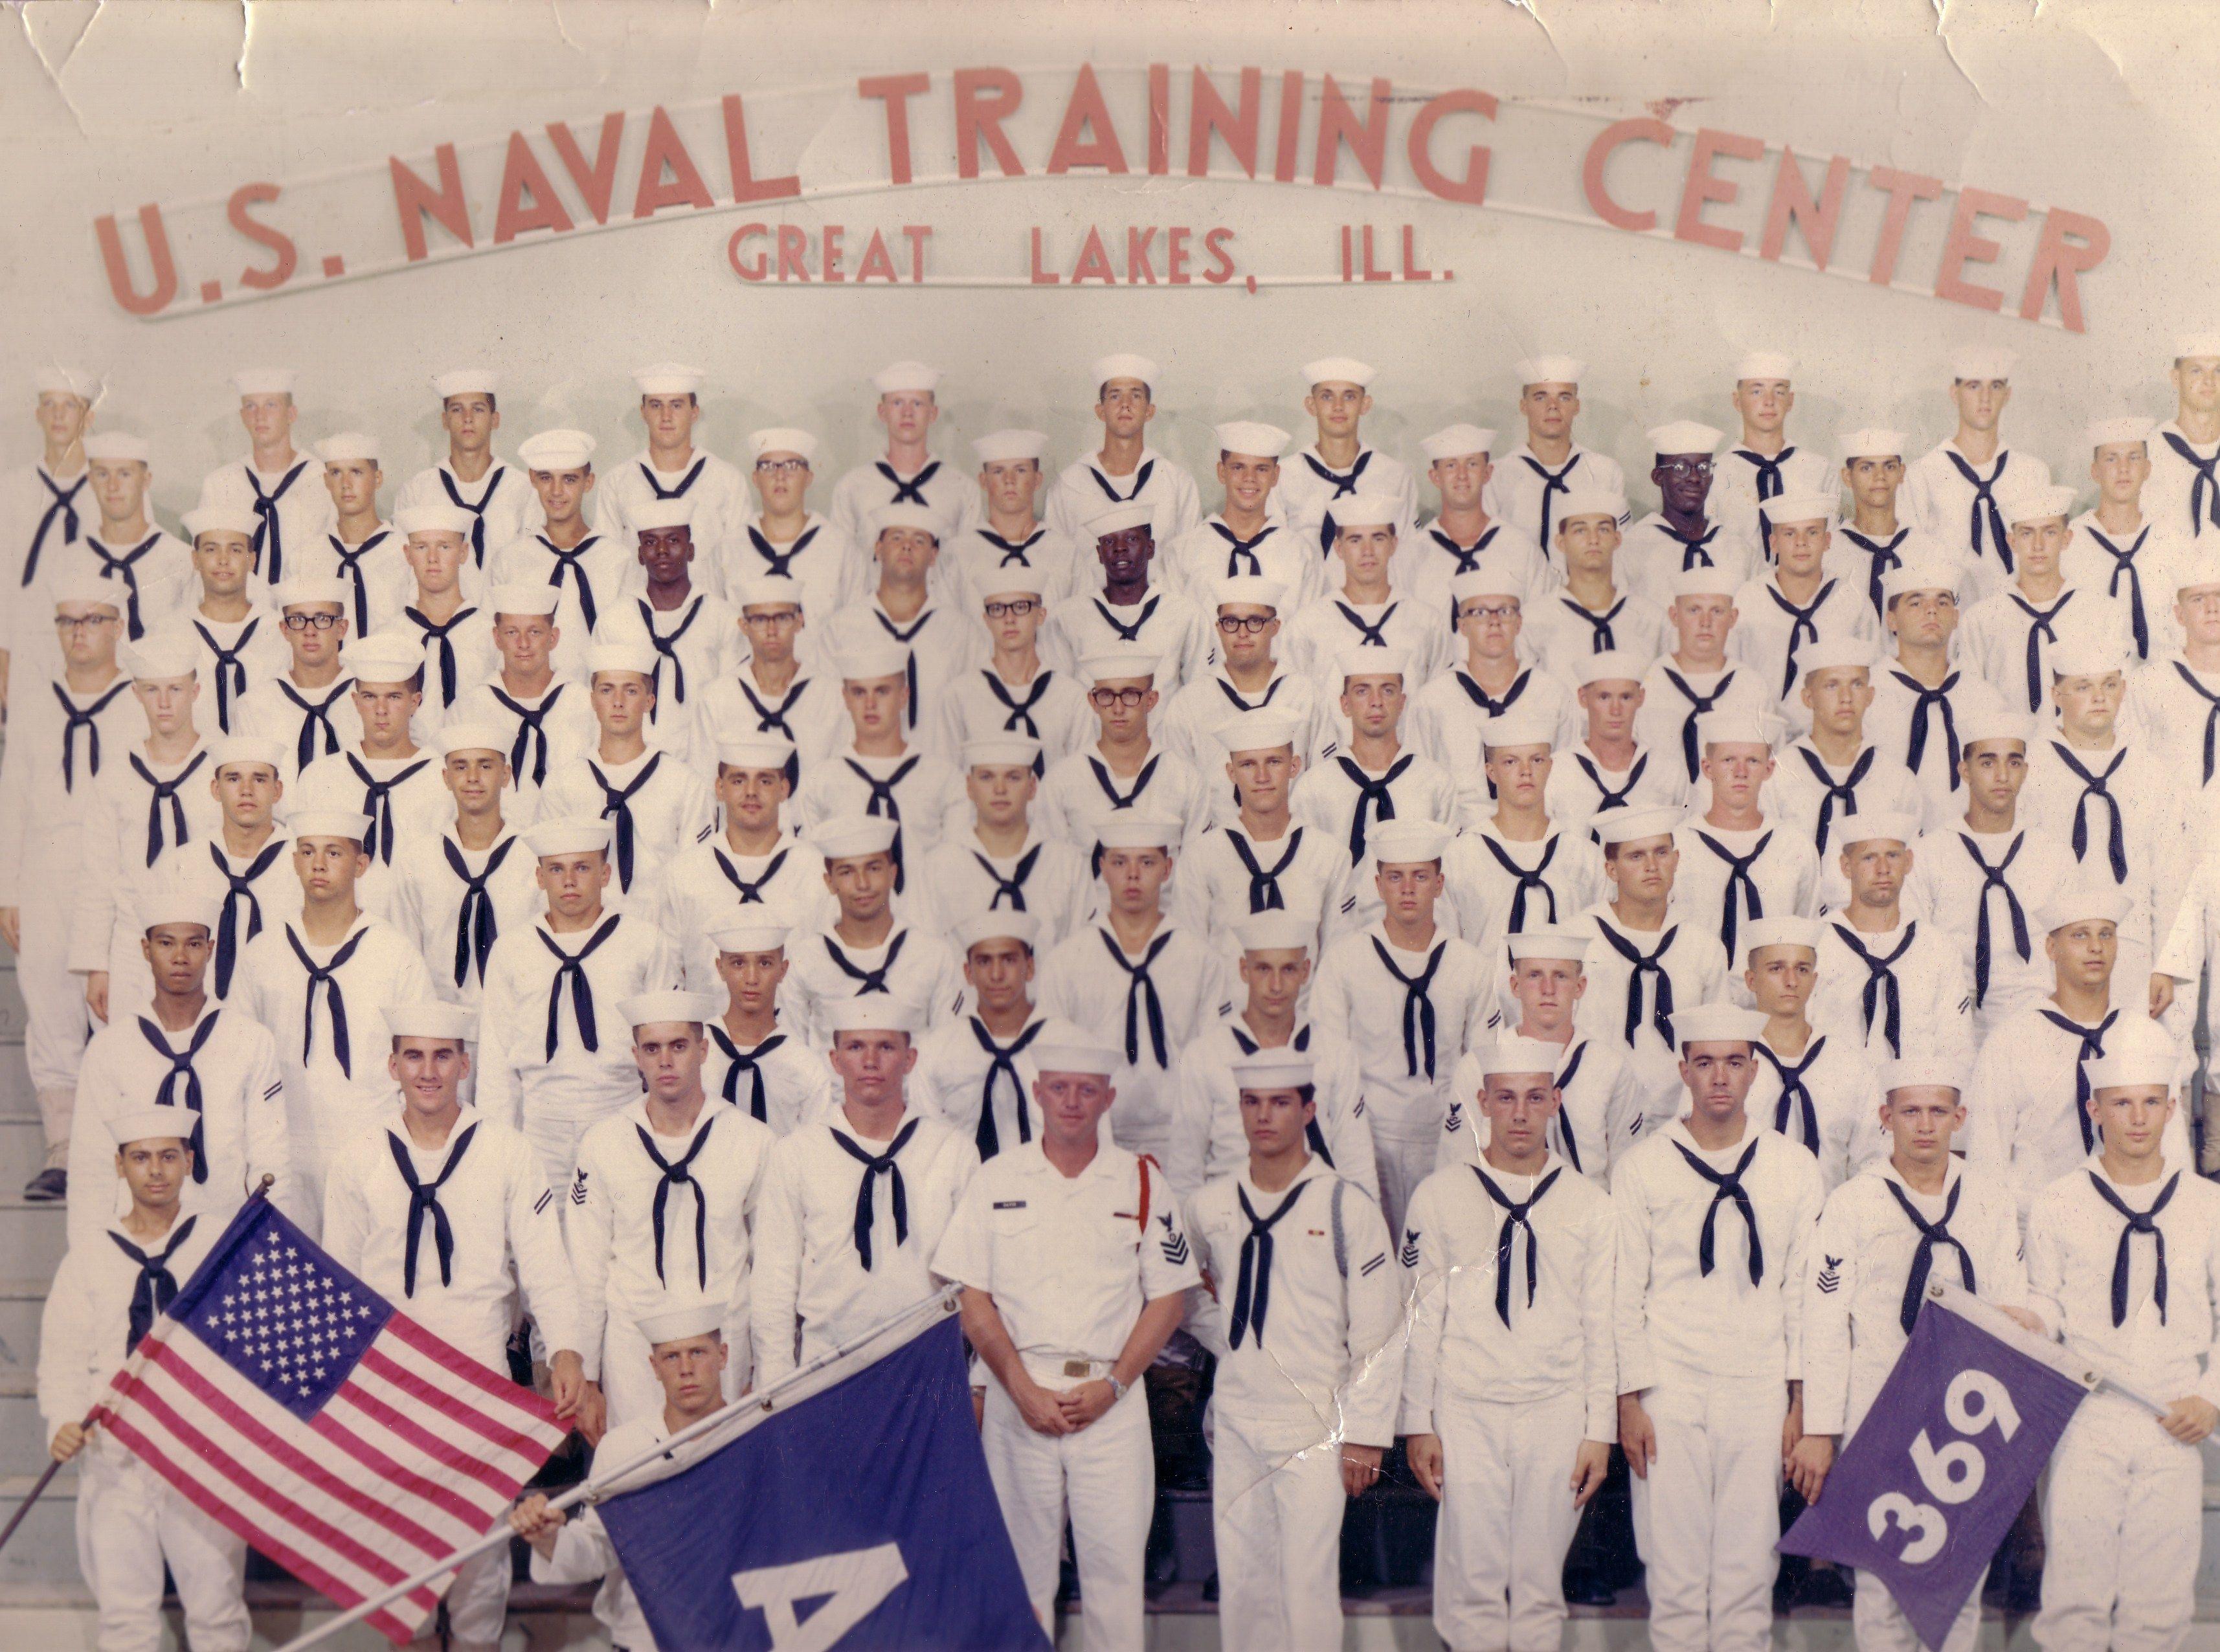 Navy Boot Camp Graduation Photo Great Lakes Illinois 1968 Navy Day Graduation Photos Great Lakes